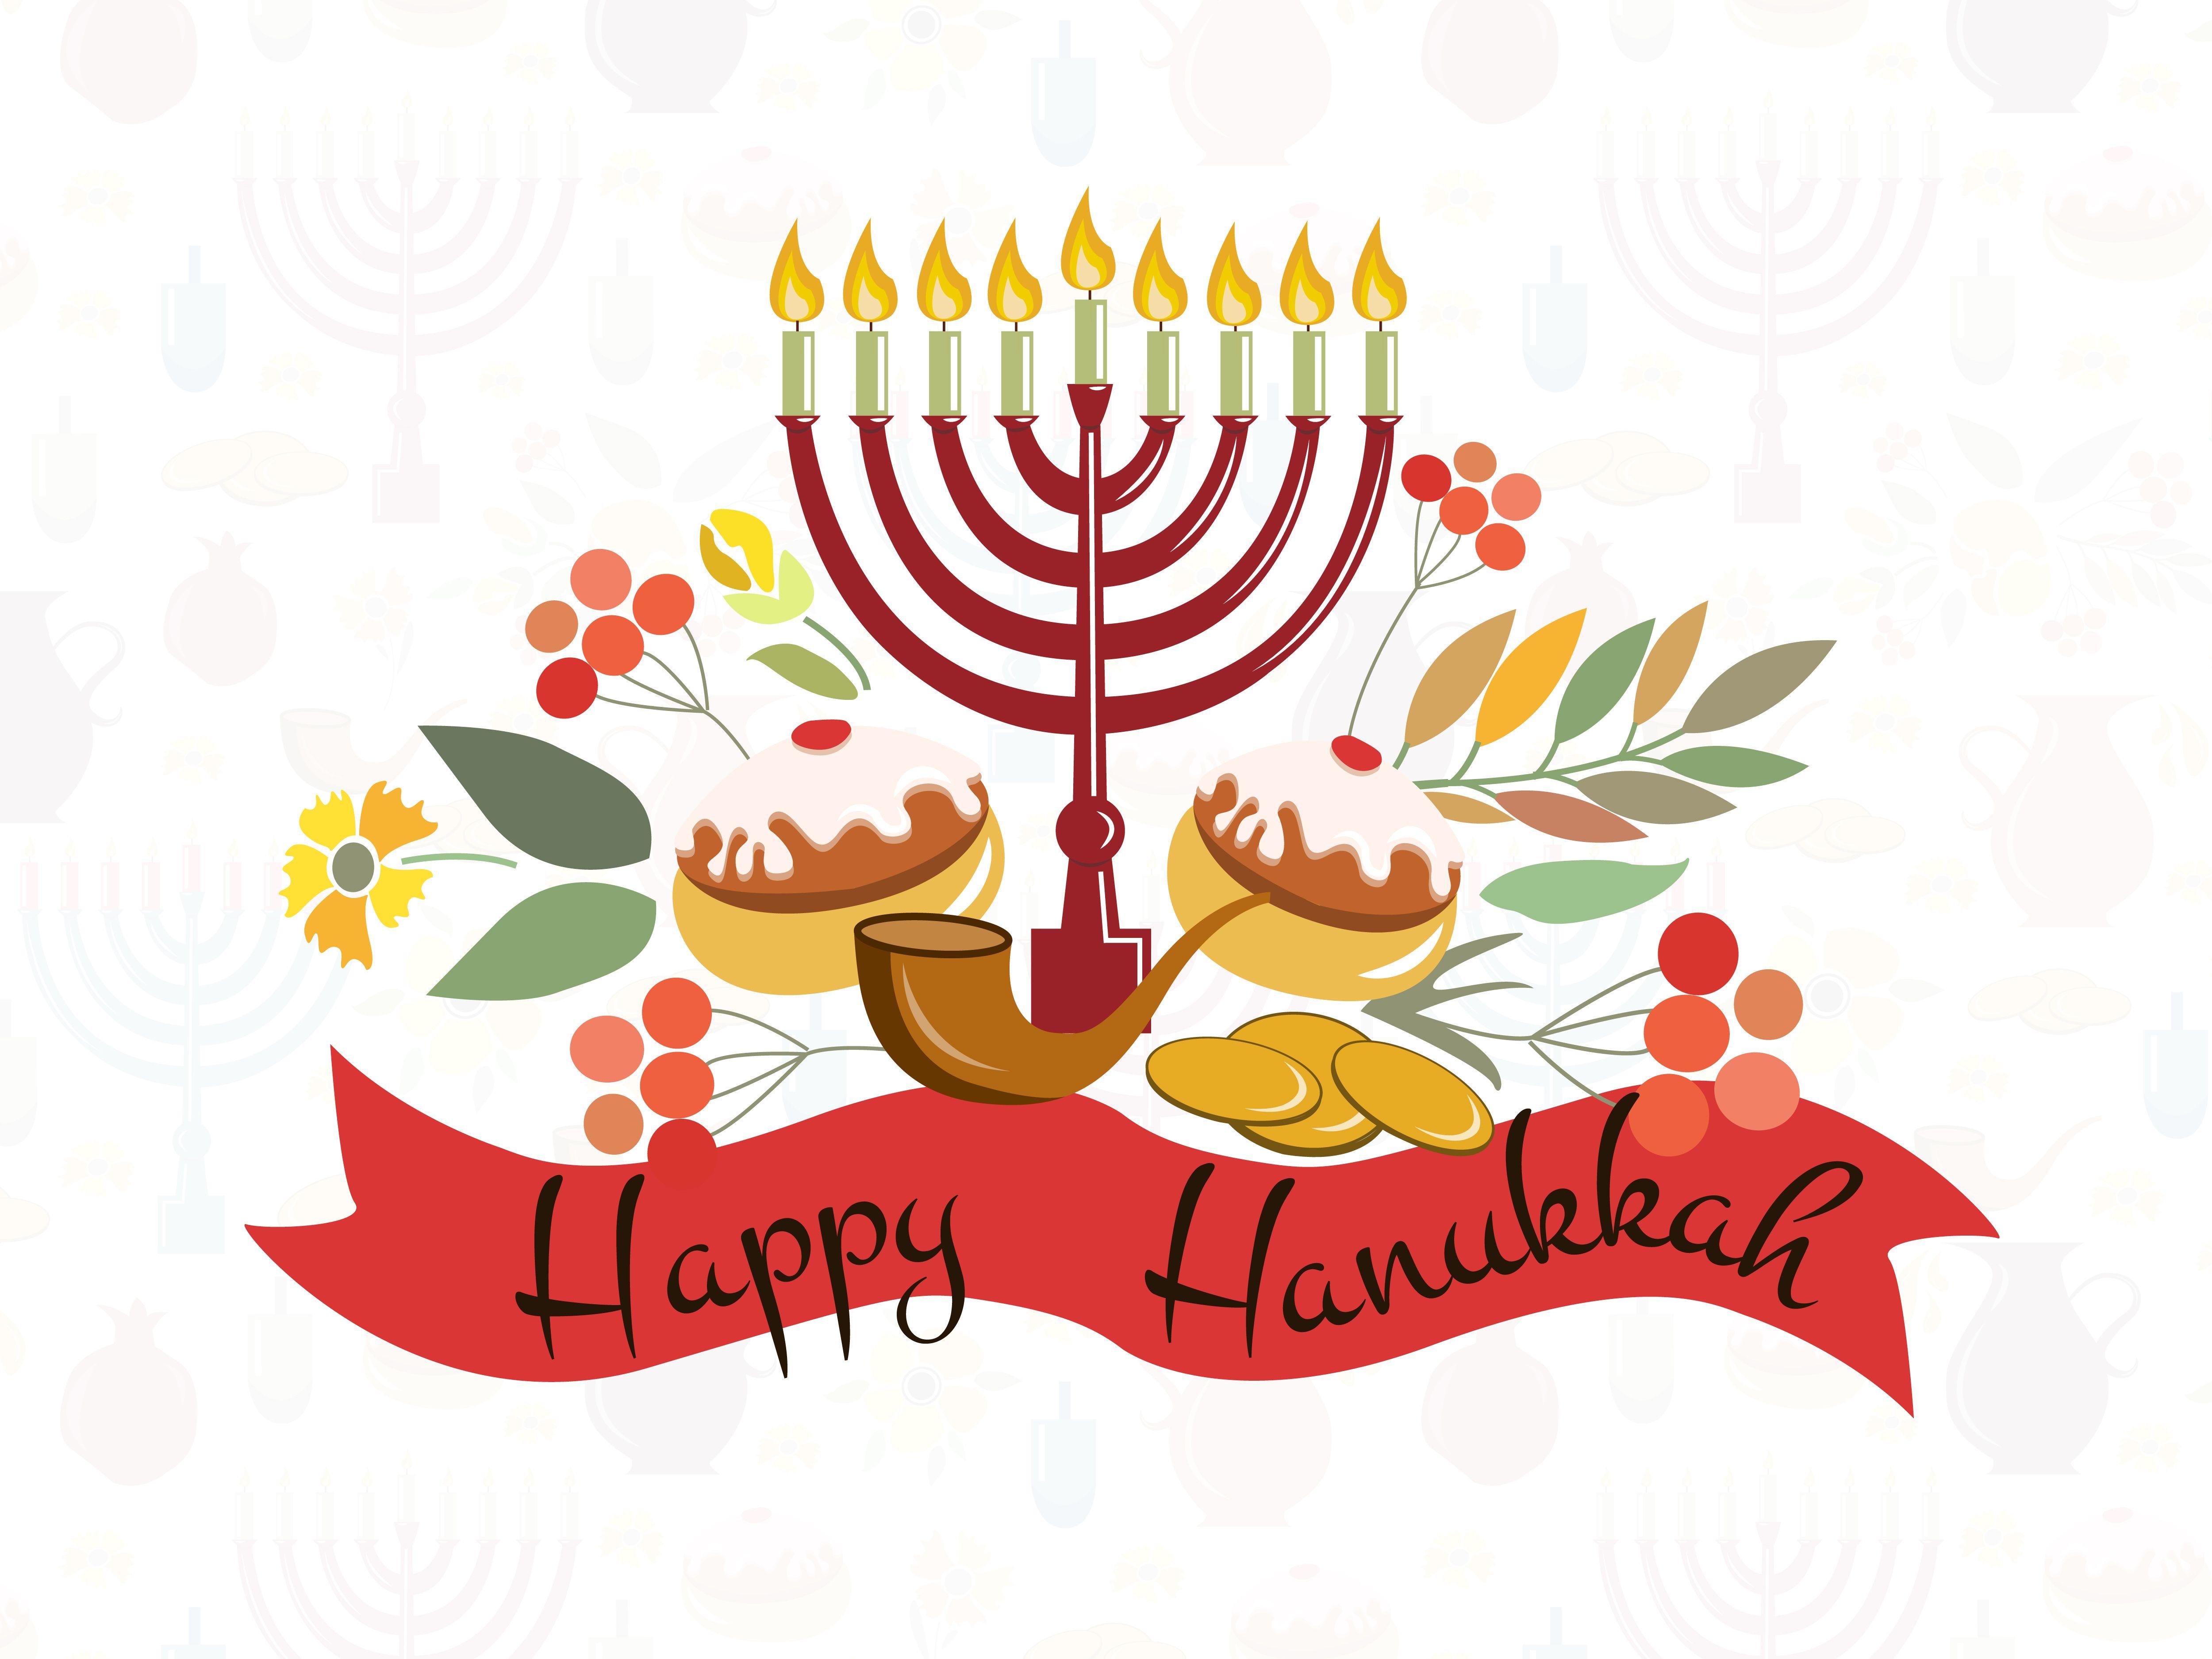 Happy Hanukkah Watercolor Card   Watercolor cards, Hanukkah and Card ...